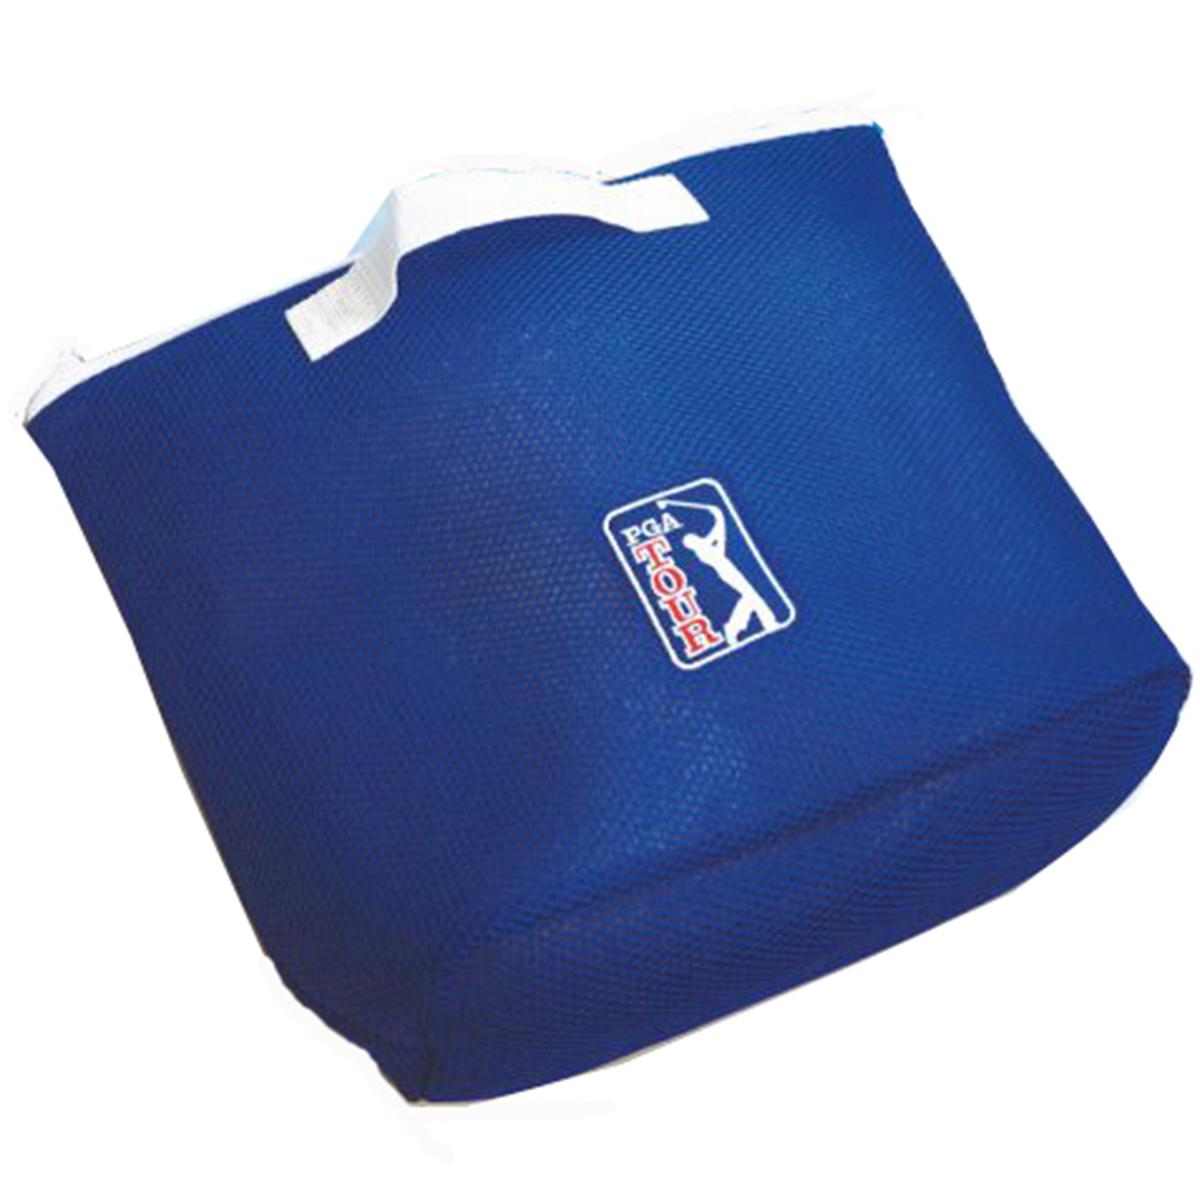 US PGA TOUR ランドリーミニトートバッグ